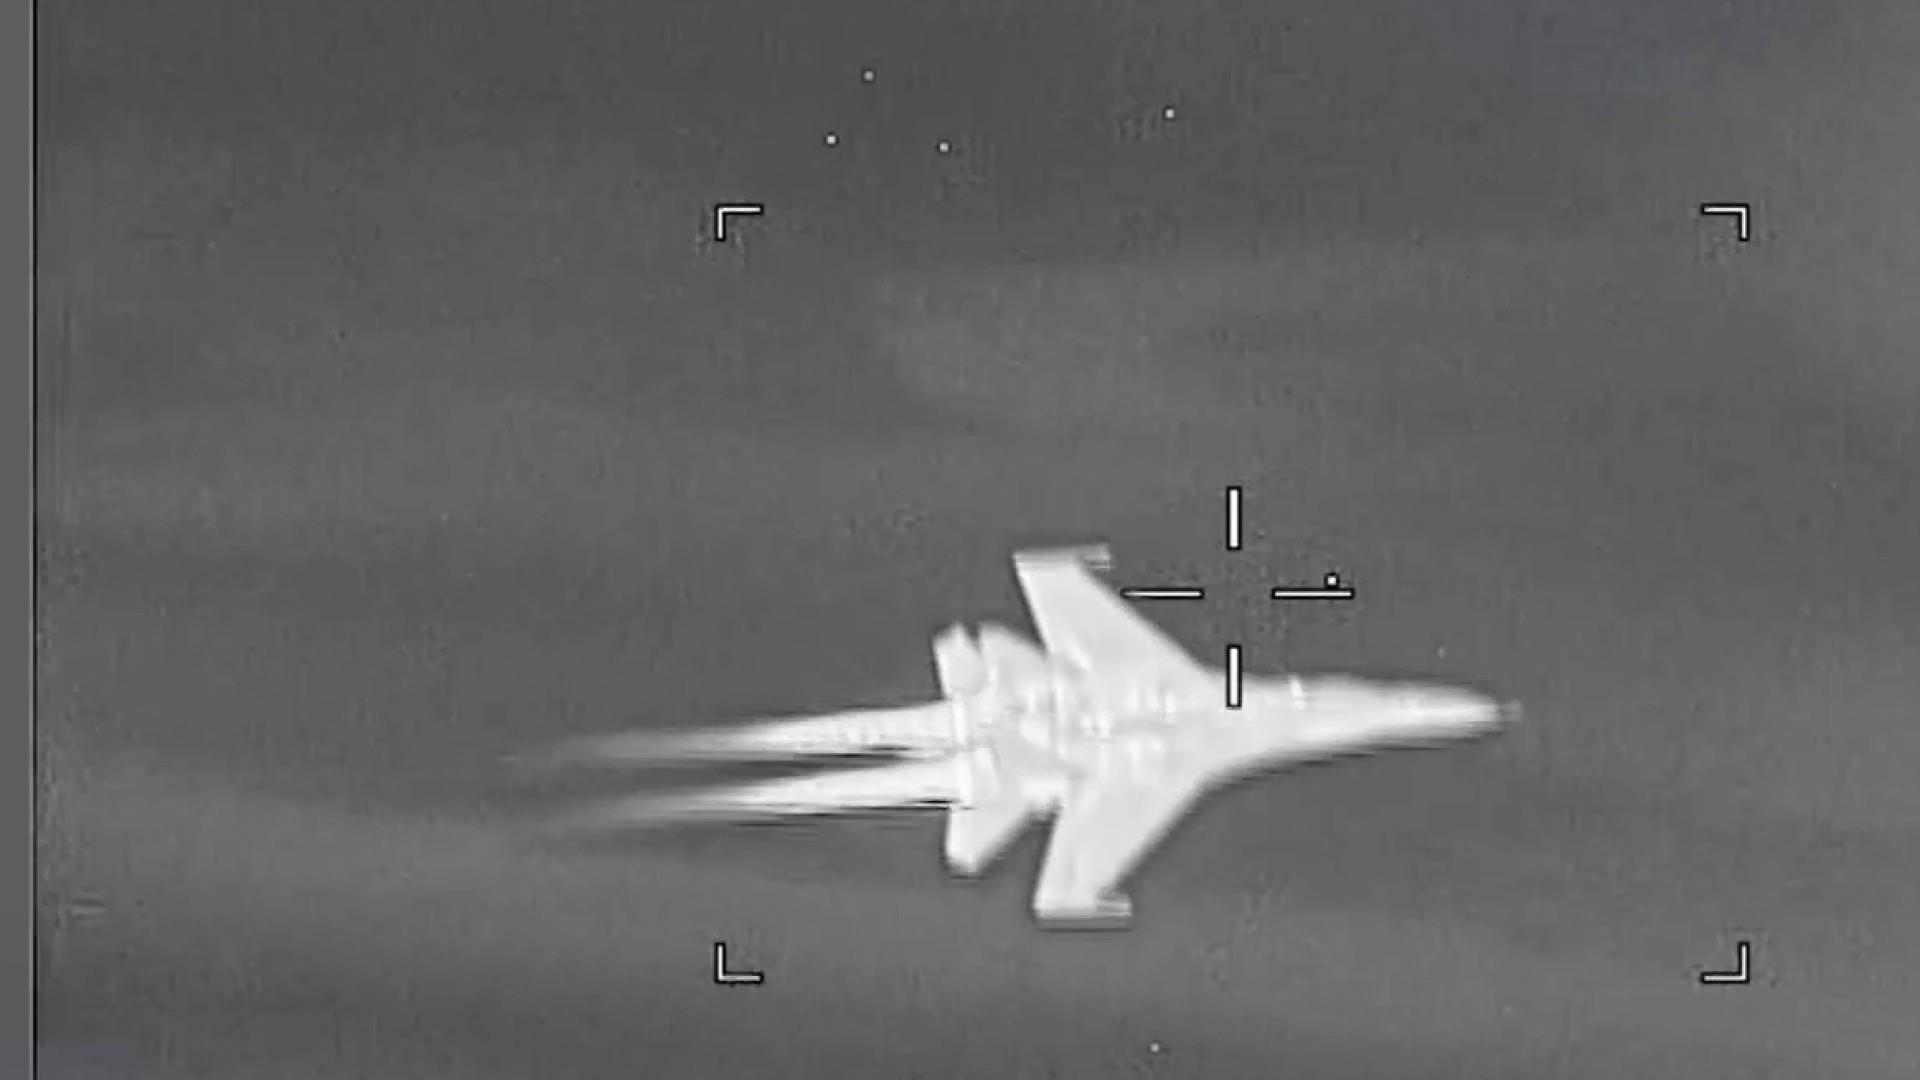 Video shows Venezuelan fighter jet 'aggressively shadowed' U.S. aircraft, Pentagon says